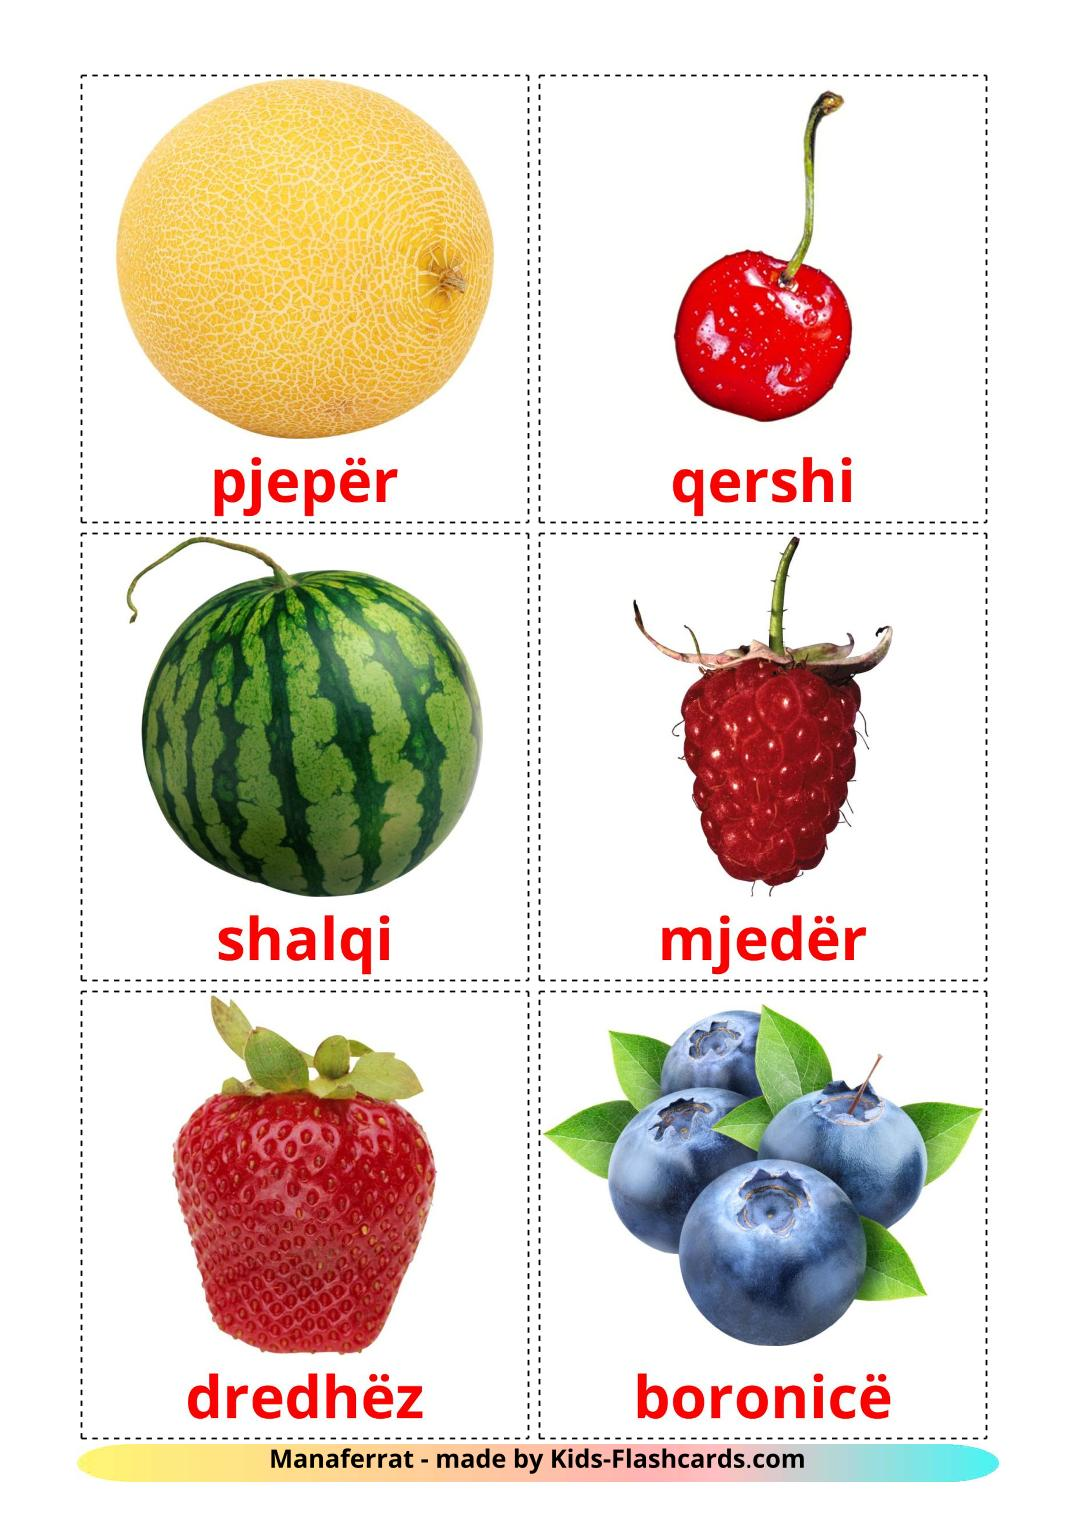 Berries - 11 Free Printable albanian Flashcards